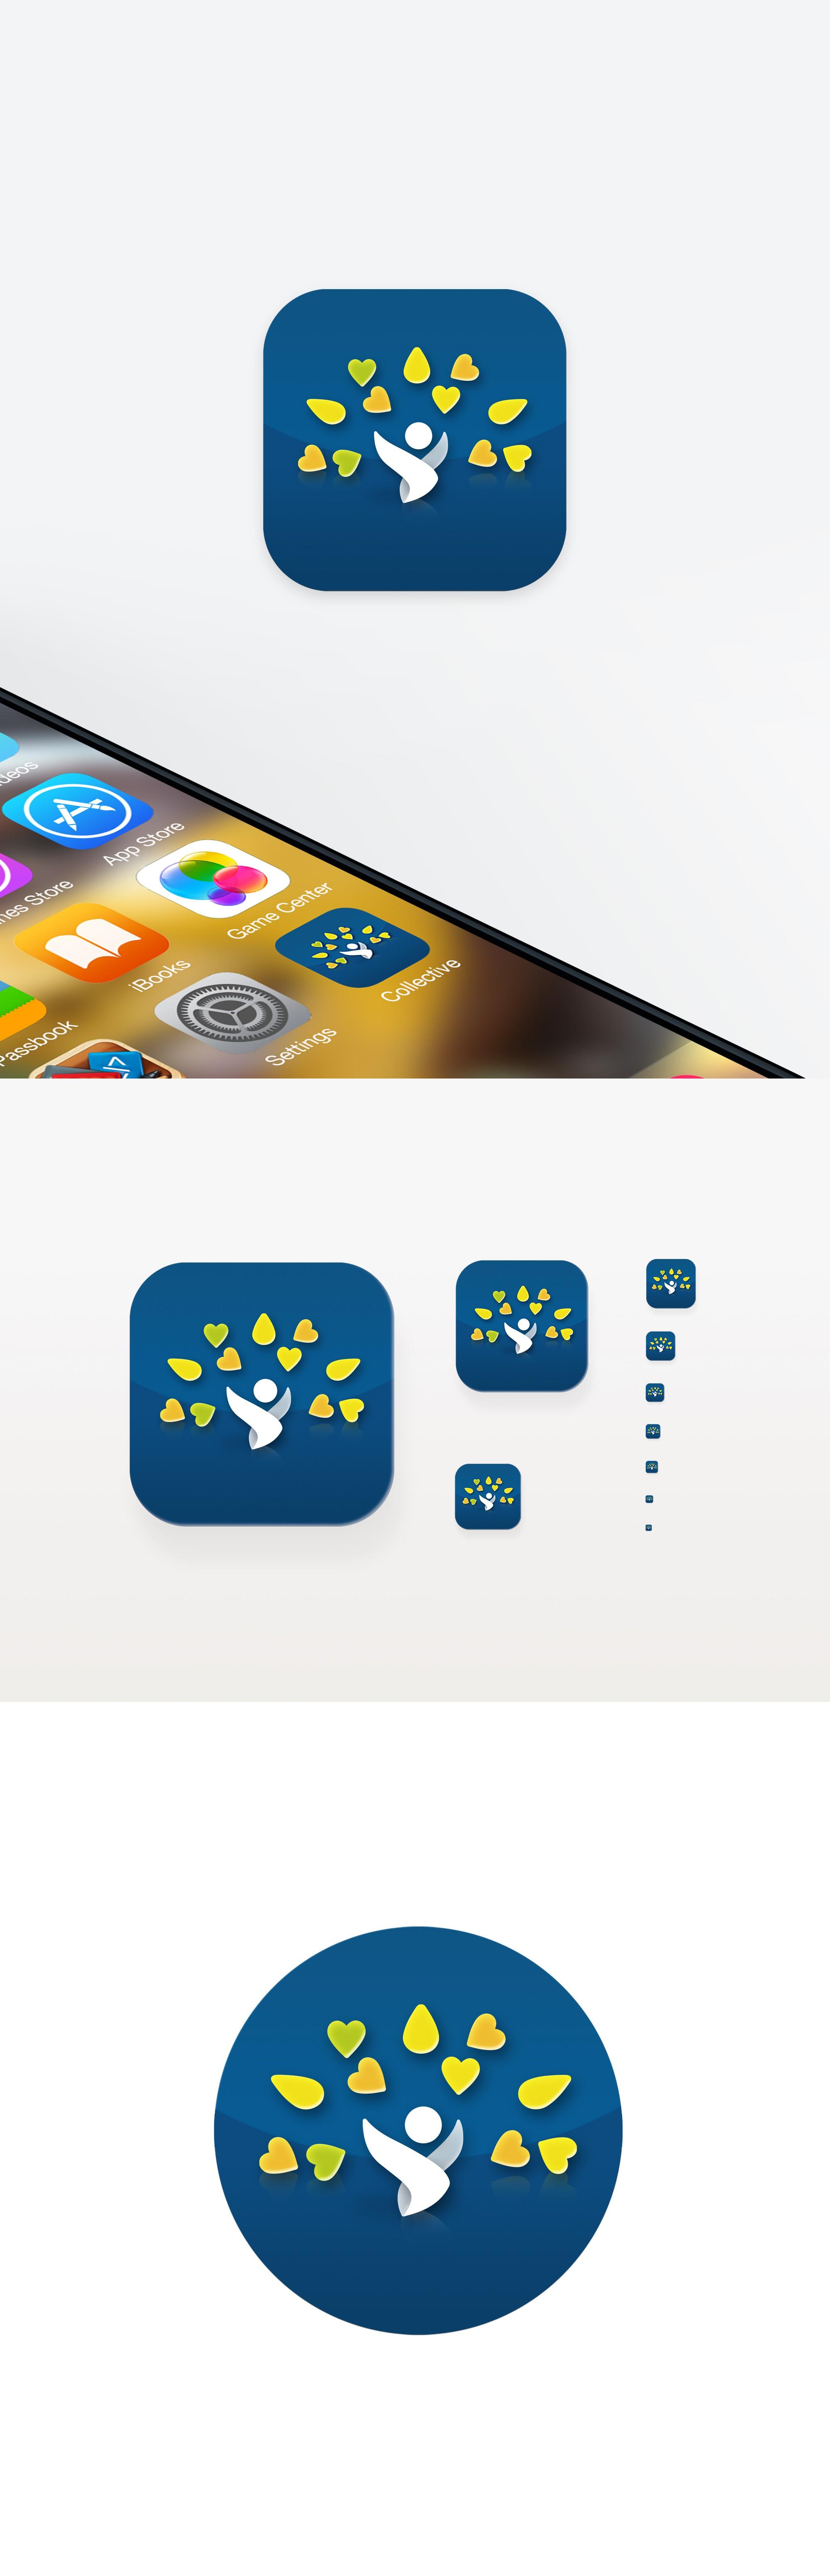 App Icon design to match logo design